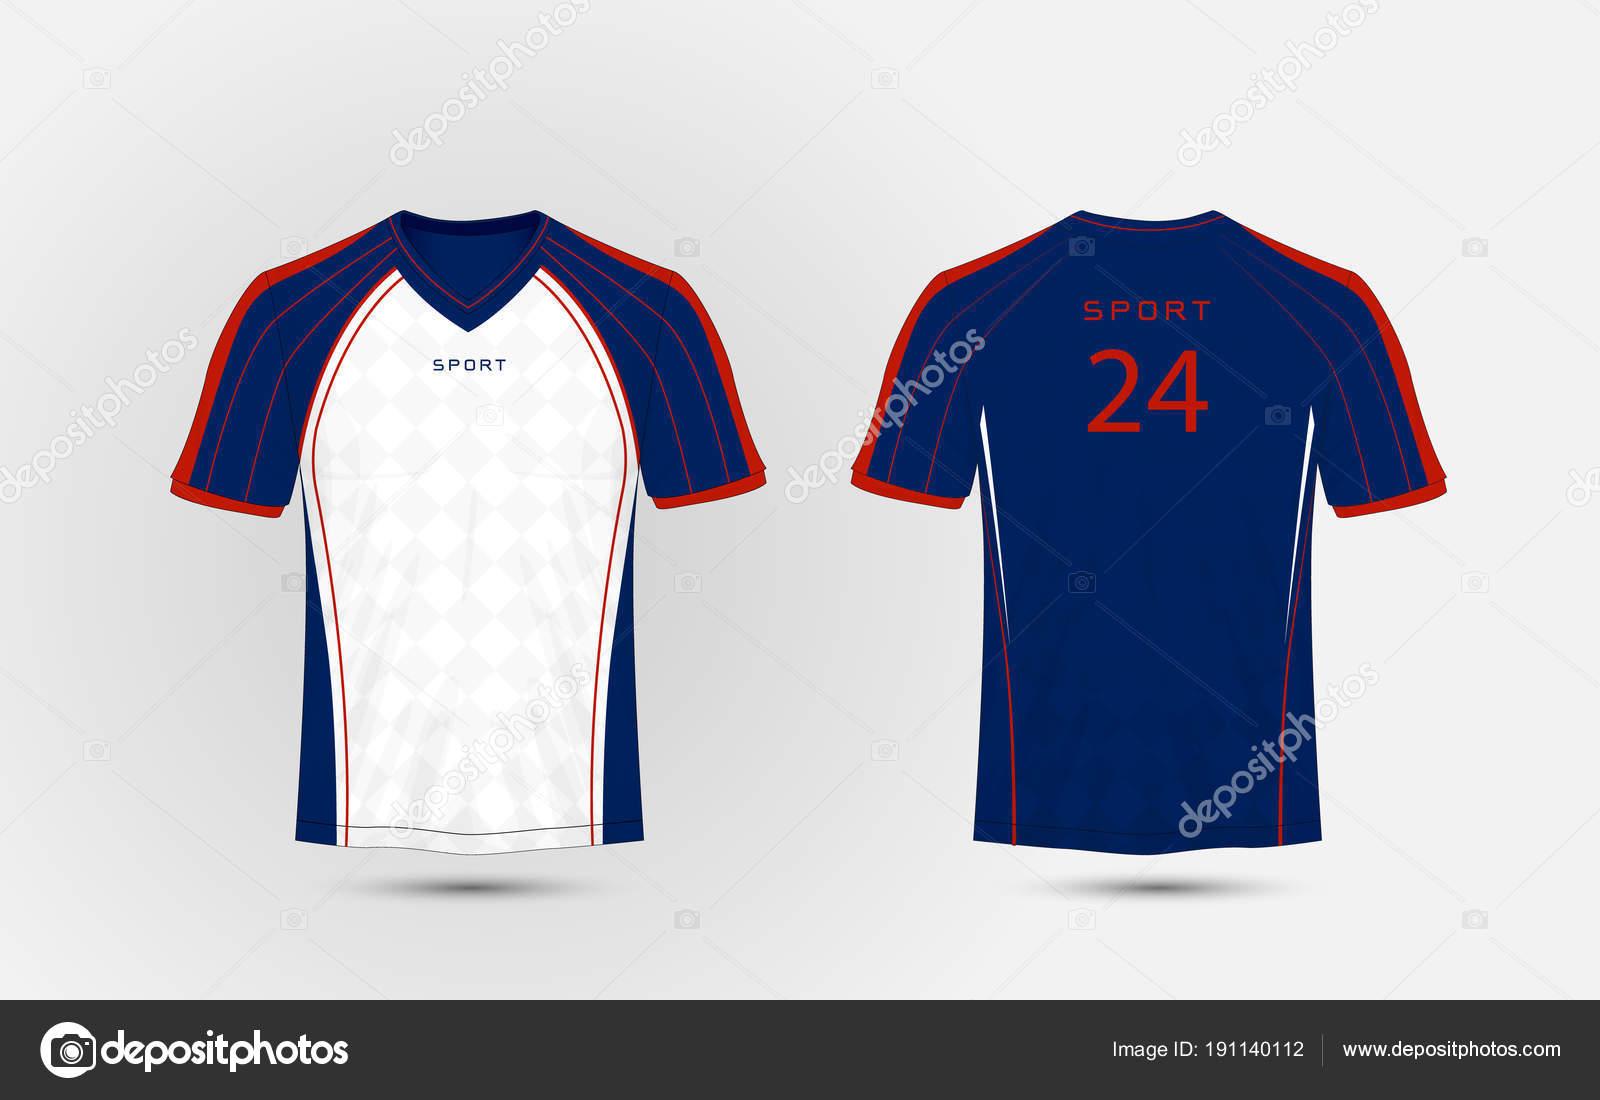 Sport Tee Shirts Designs | Blau Weiss Rote Linien Layout Fussball Sport T Shirt Bausatze Jersey